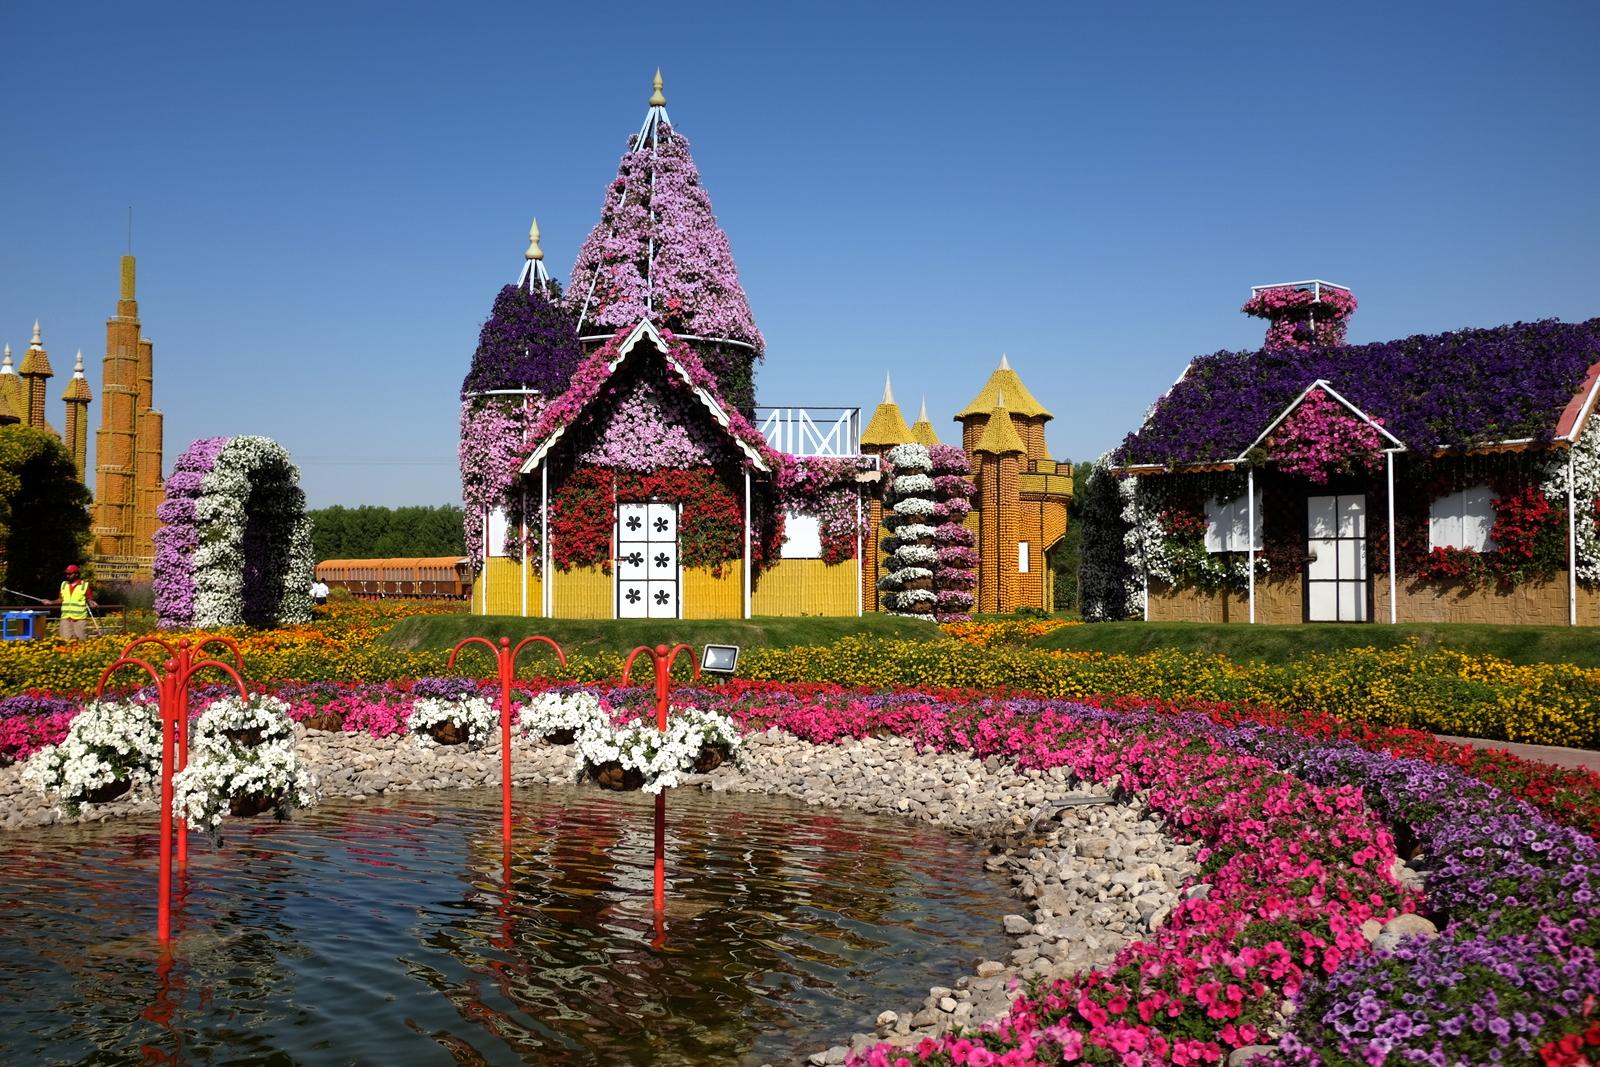 Dubai Miracle Garden - Houses and lake